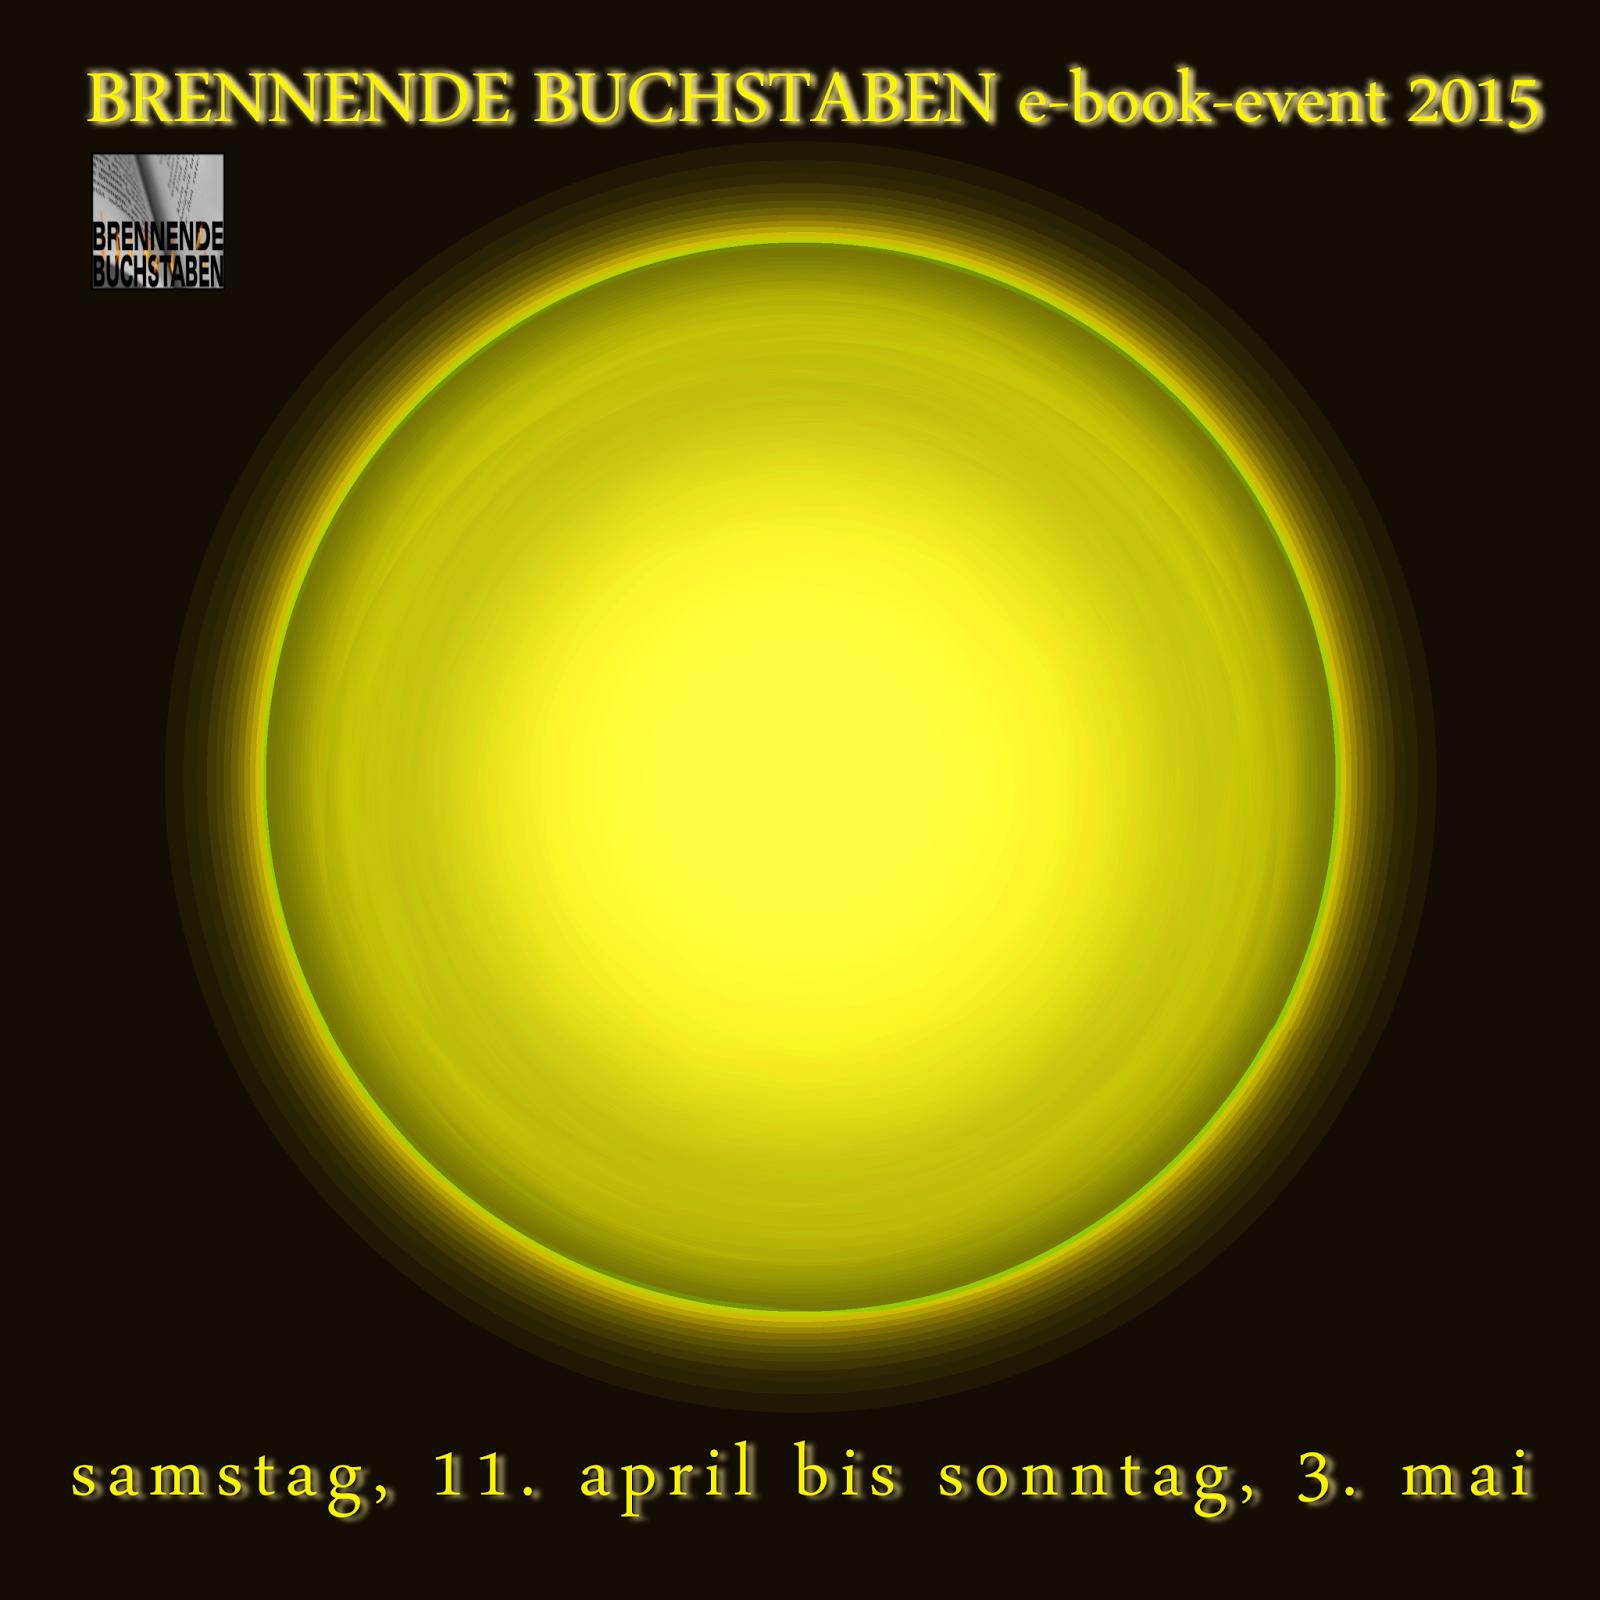 Kueperpunk2012: Nächsten Samstag geht`s los: Das Brennende Buchsta...